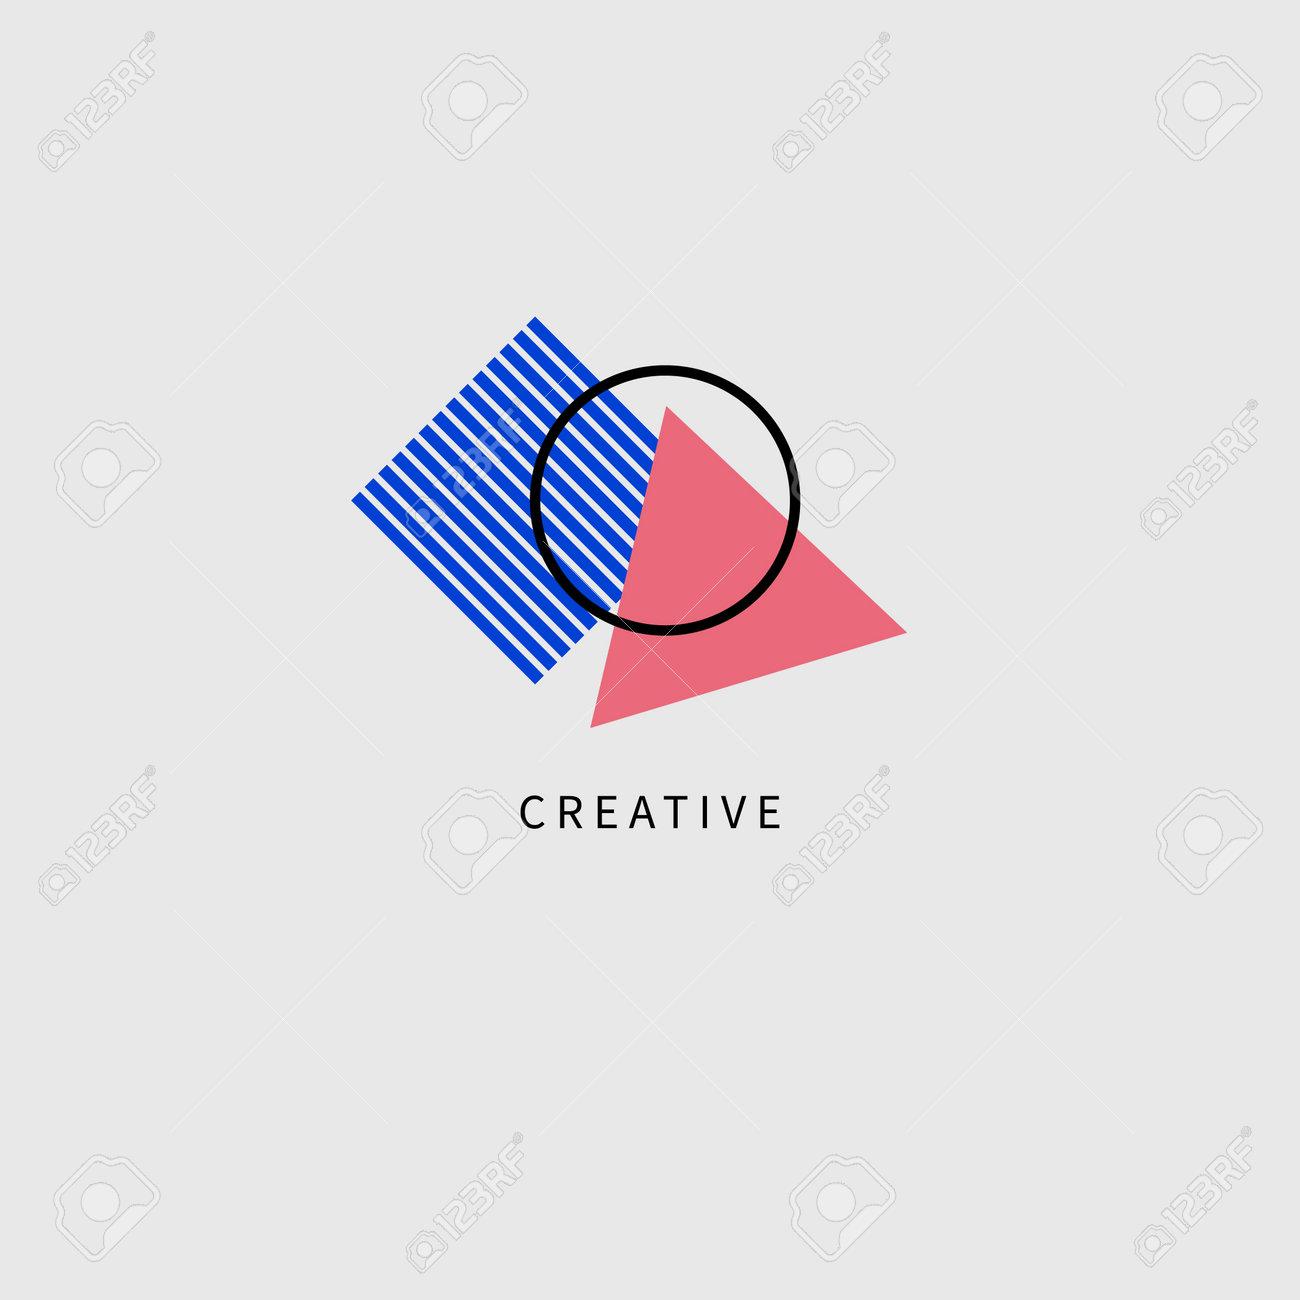 Creative geometric logo for advertising agency or brand - 161245959